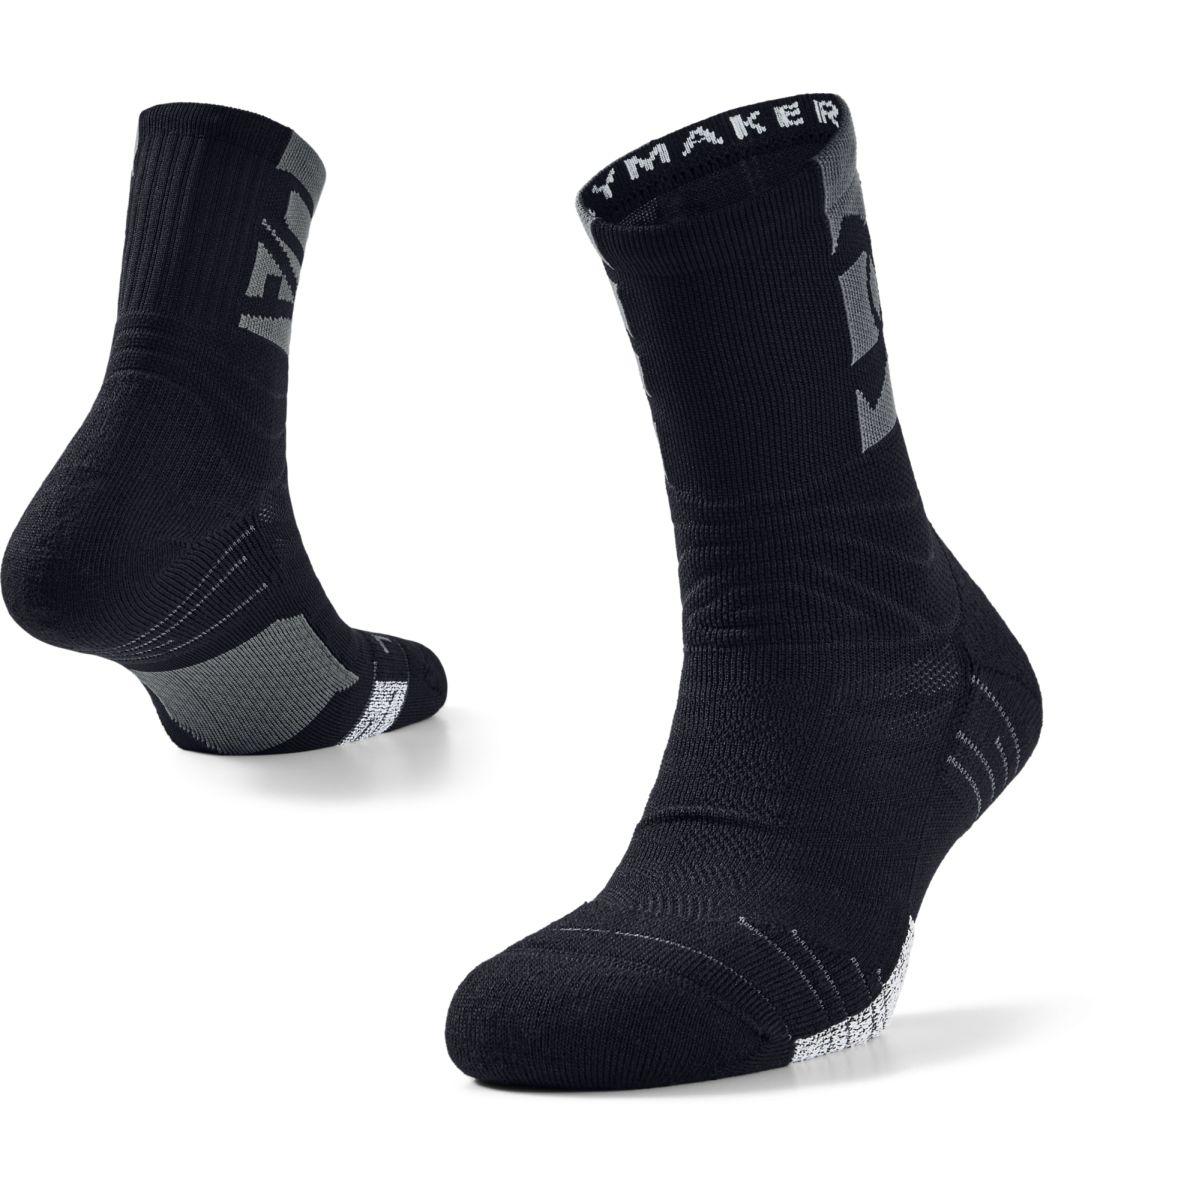 Ponožky Under Armour UA Playmaker Crew-BLK